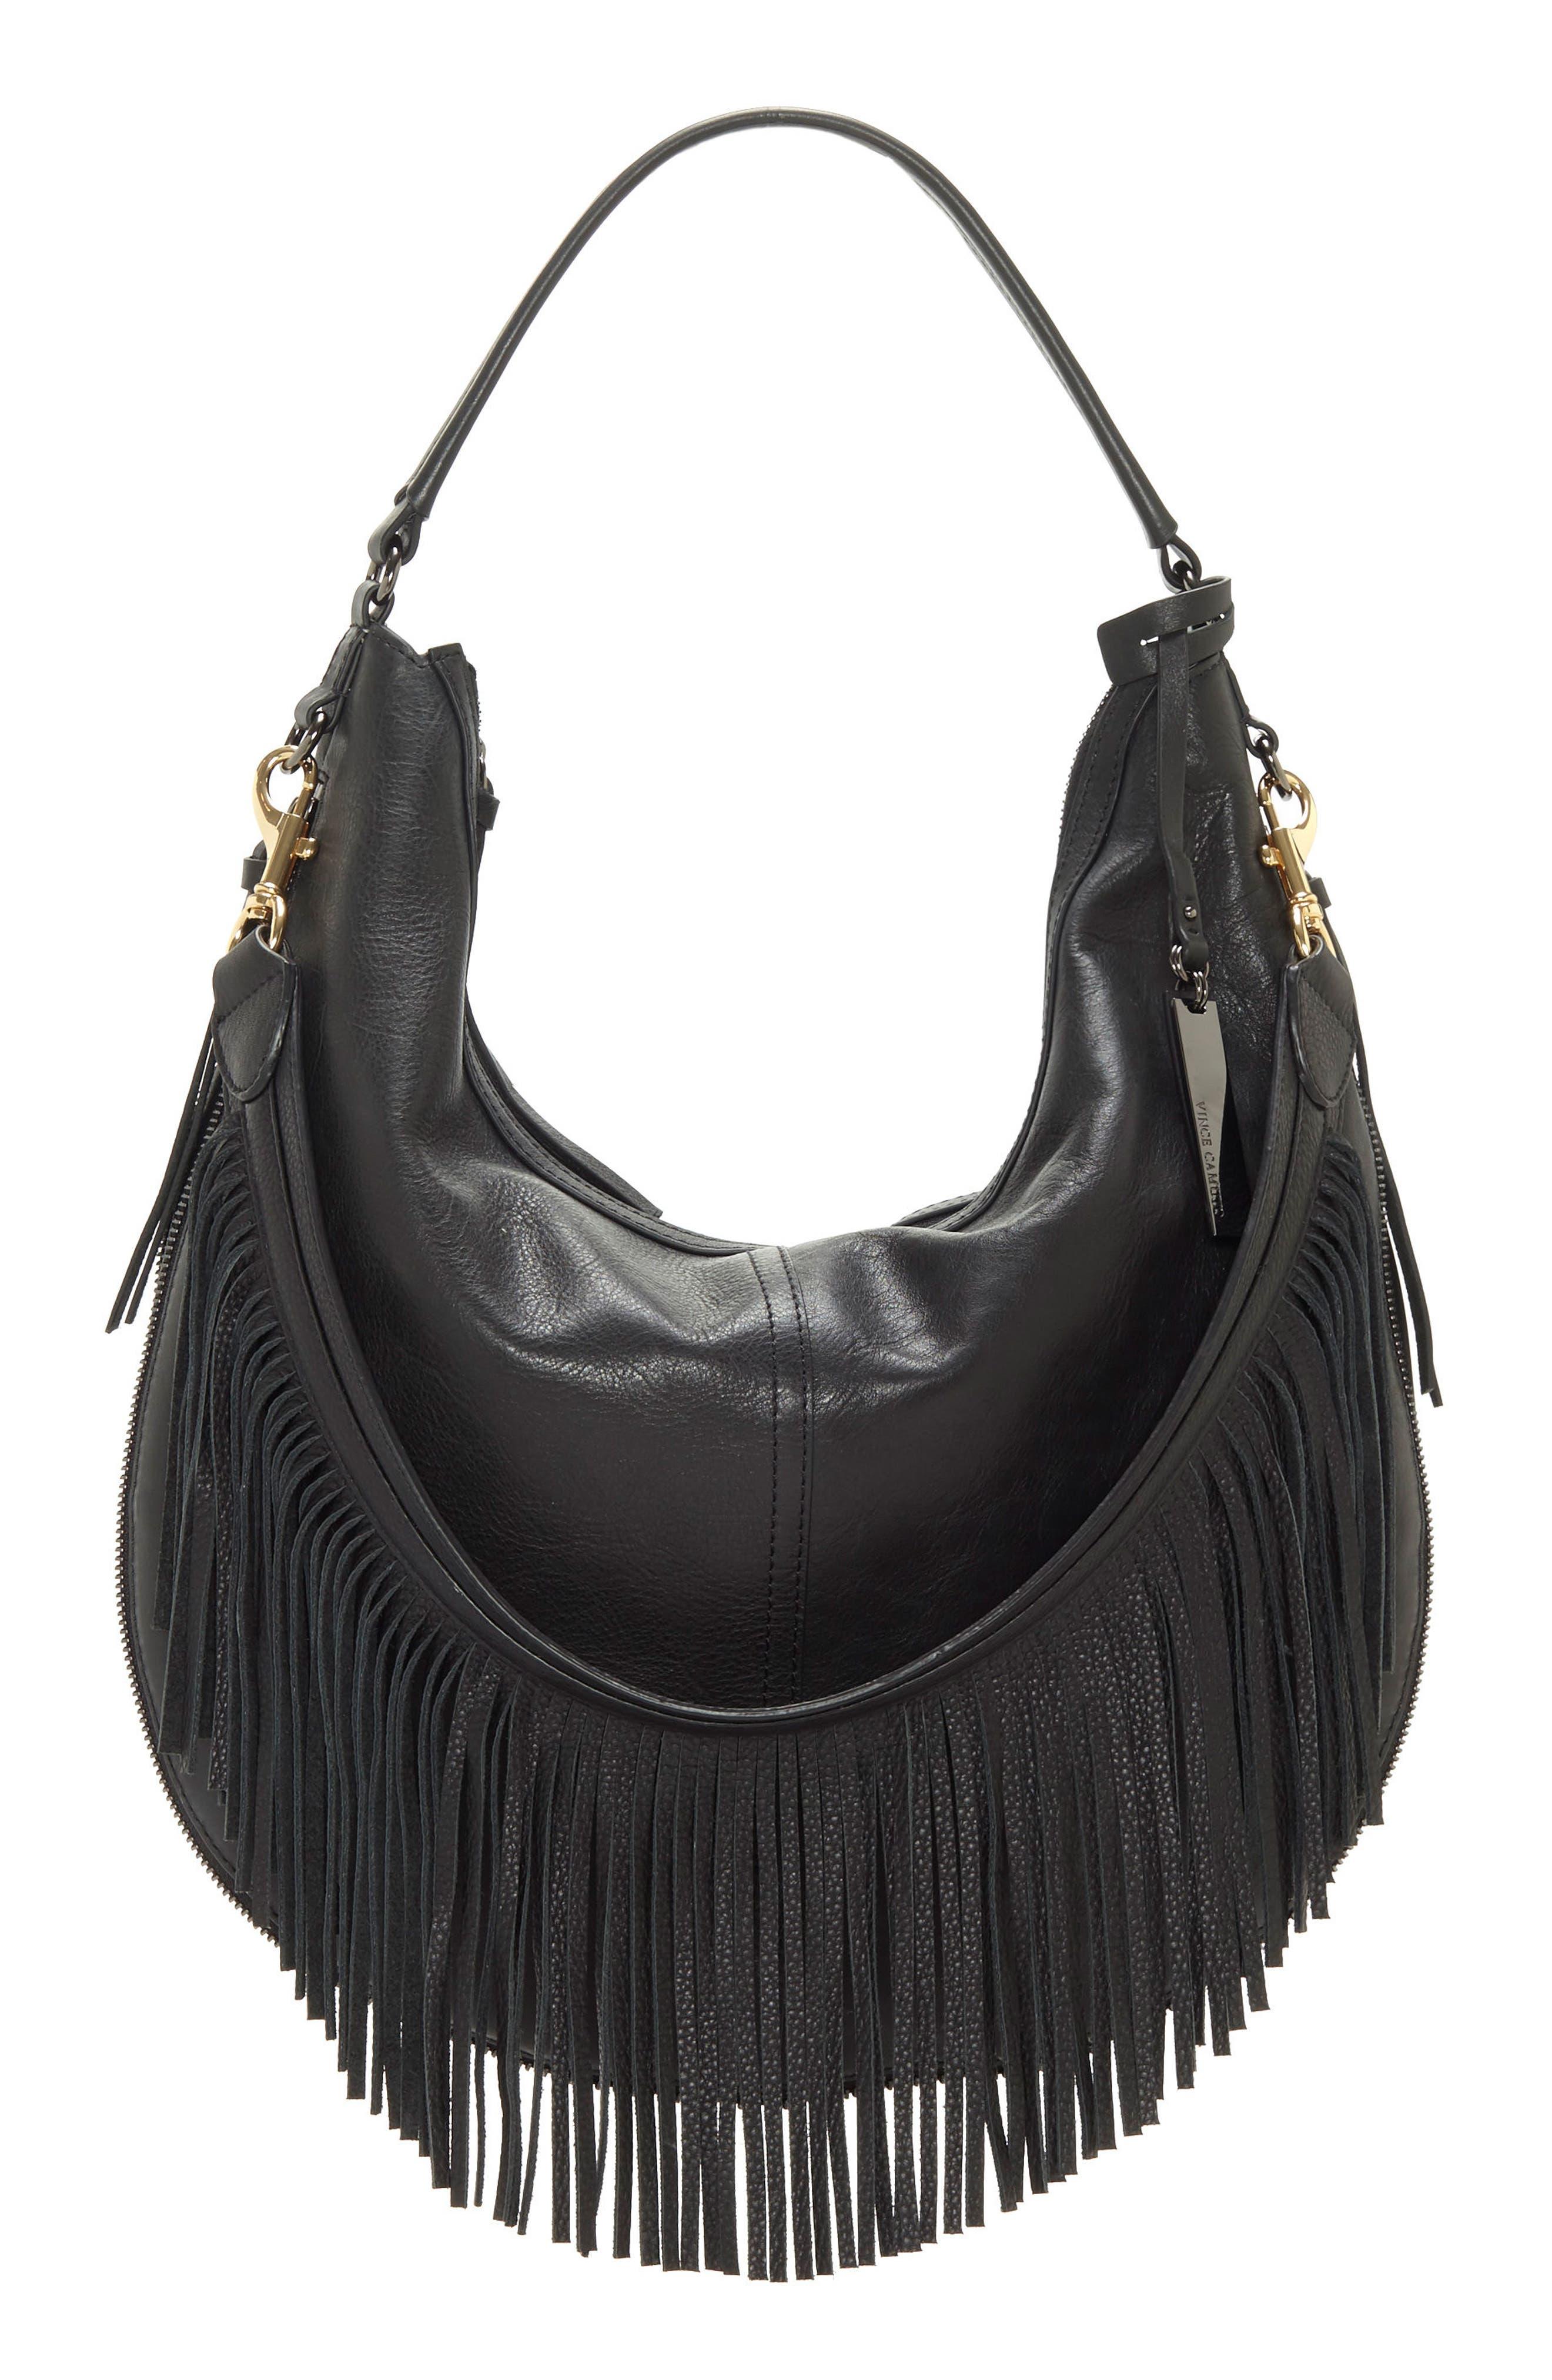 Hil Leather Hobo Bag,                             Main thumbnail 1, color,                             002